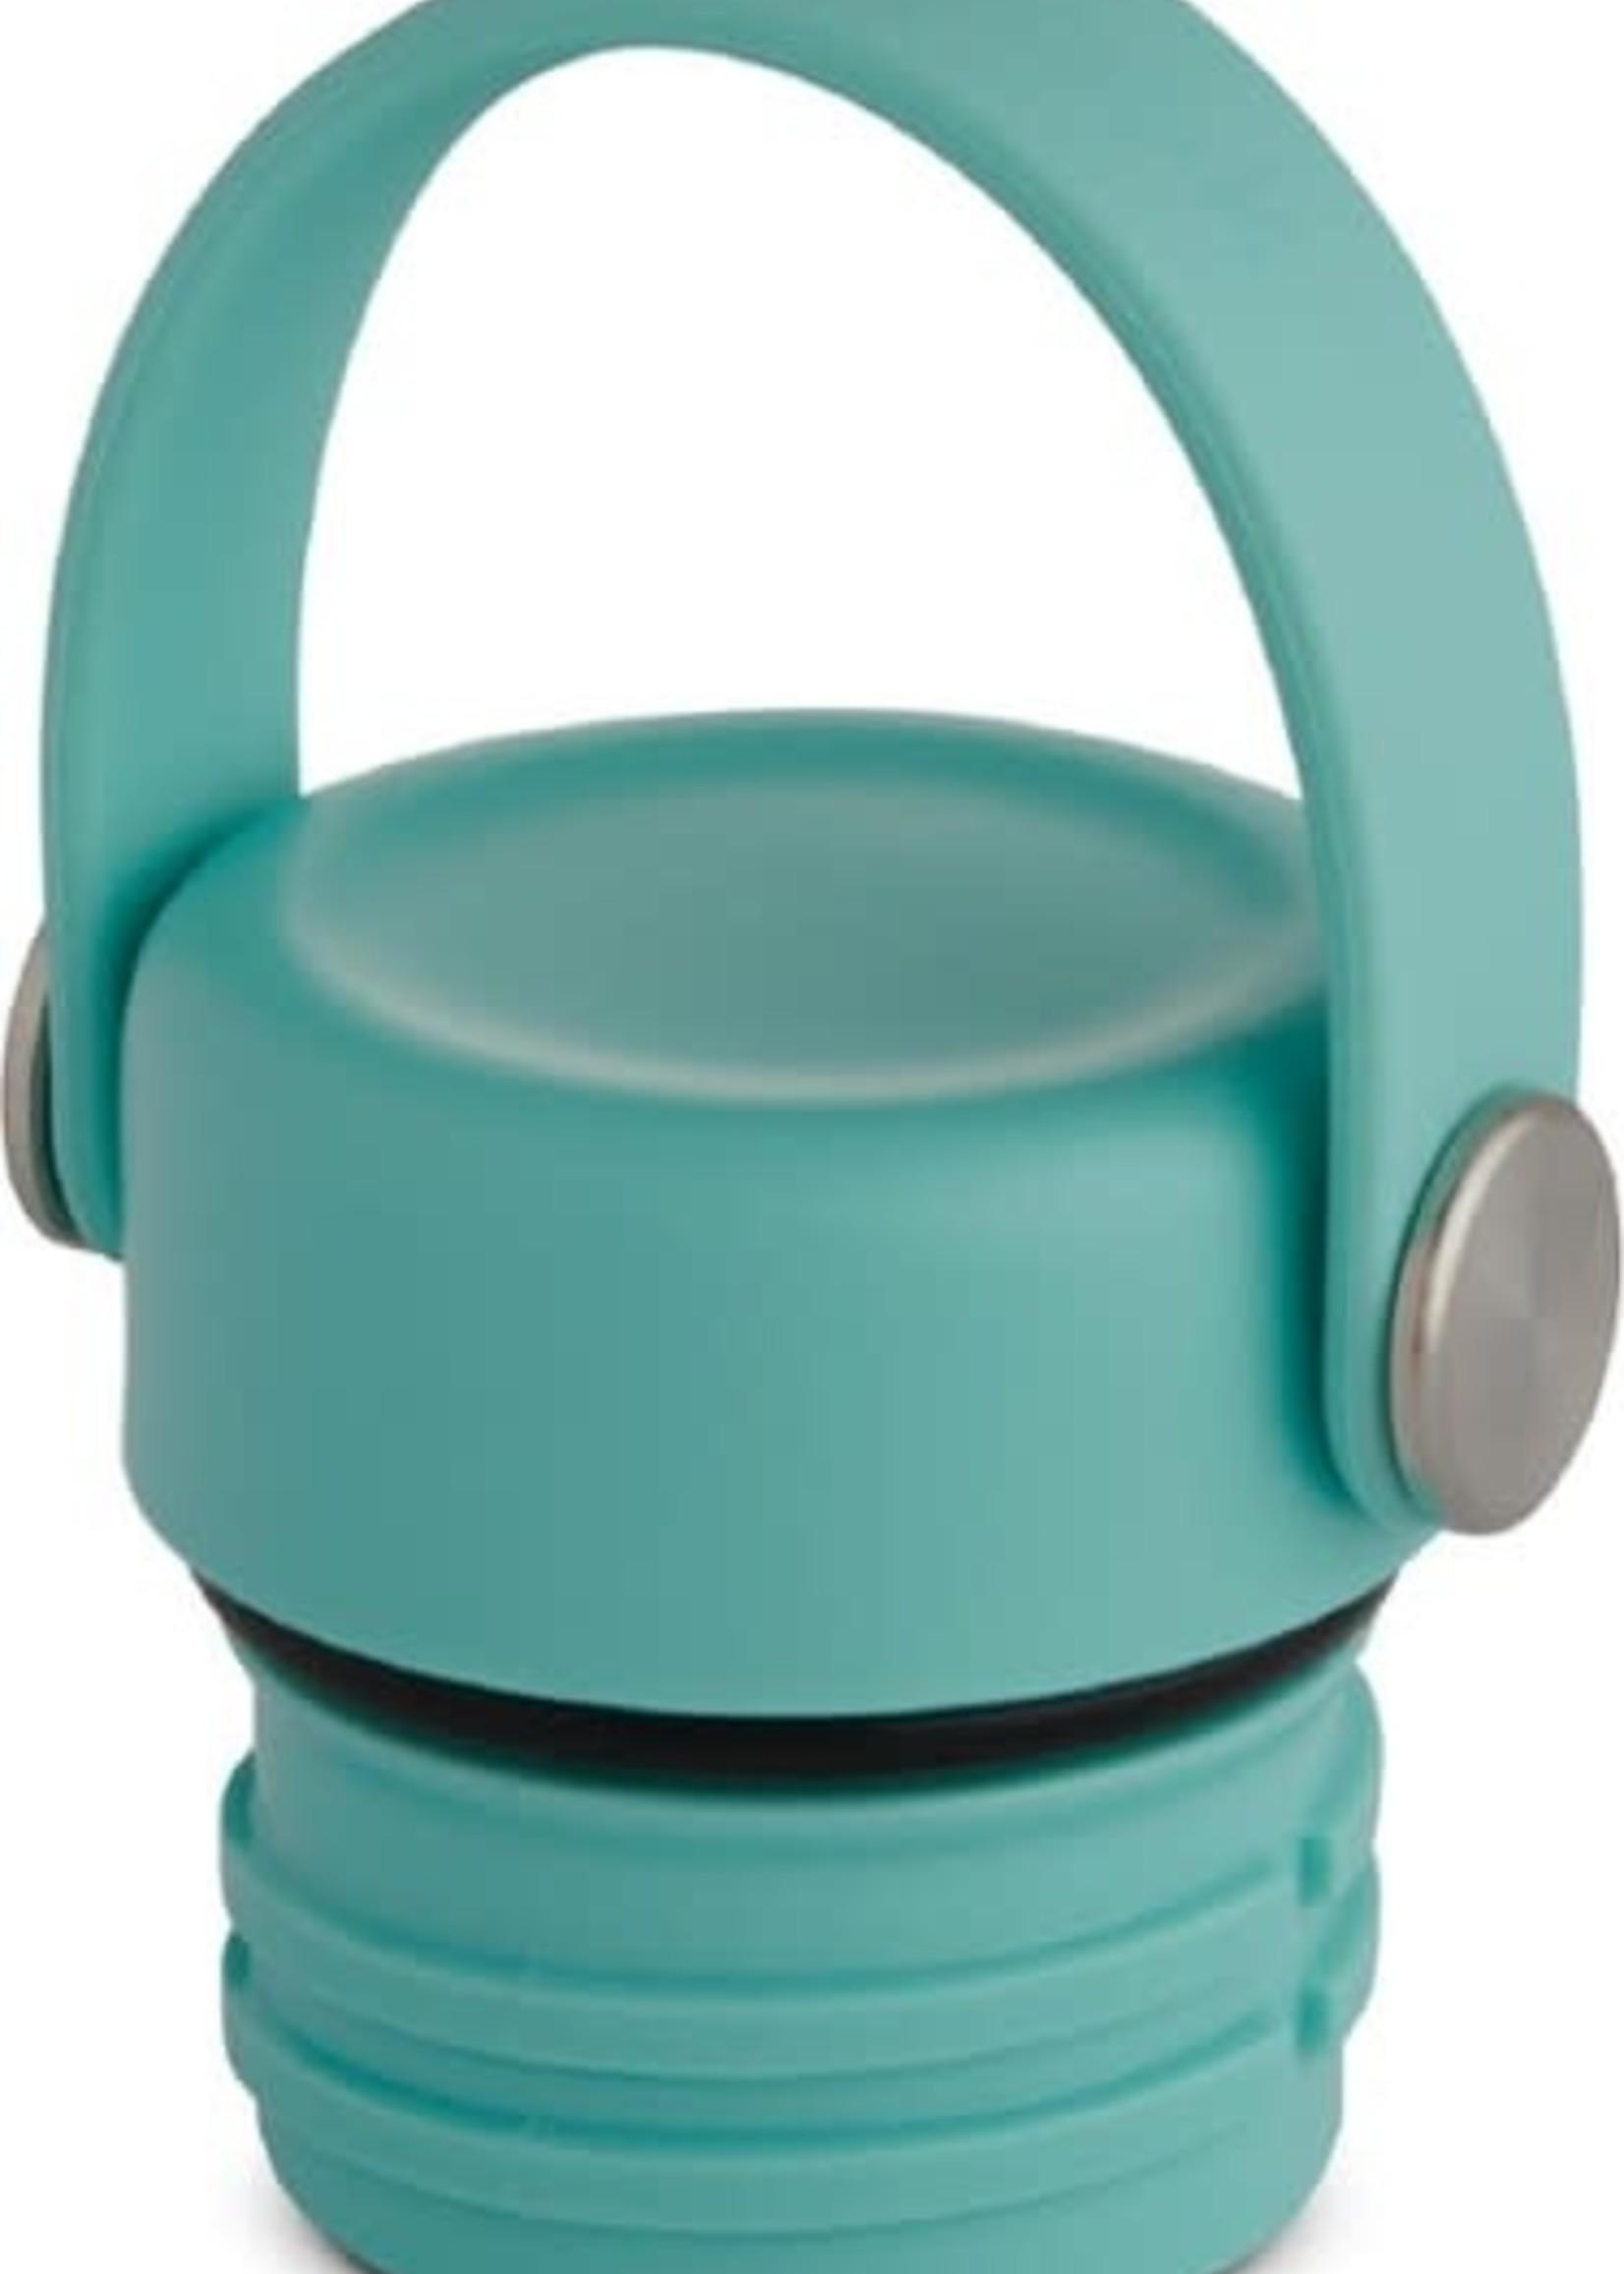 Hydro Flask Hydro Lid - Standard Flex Cap